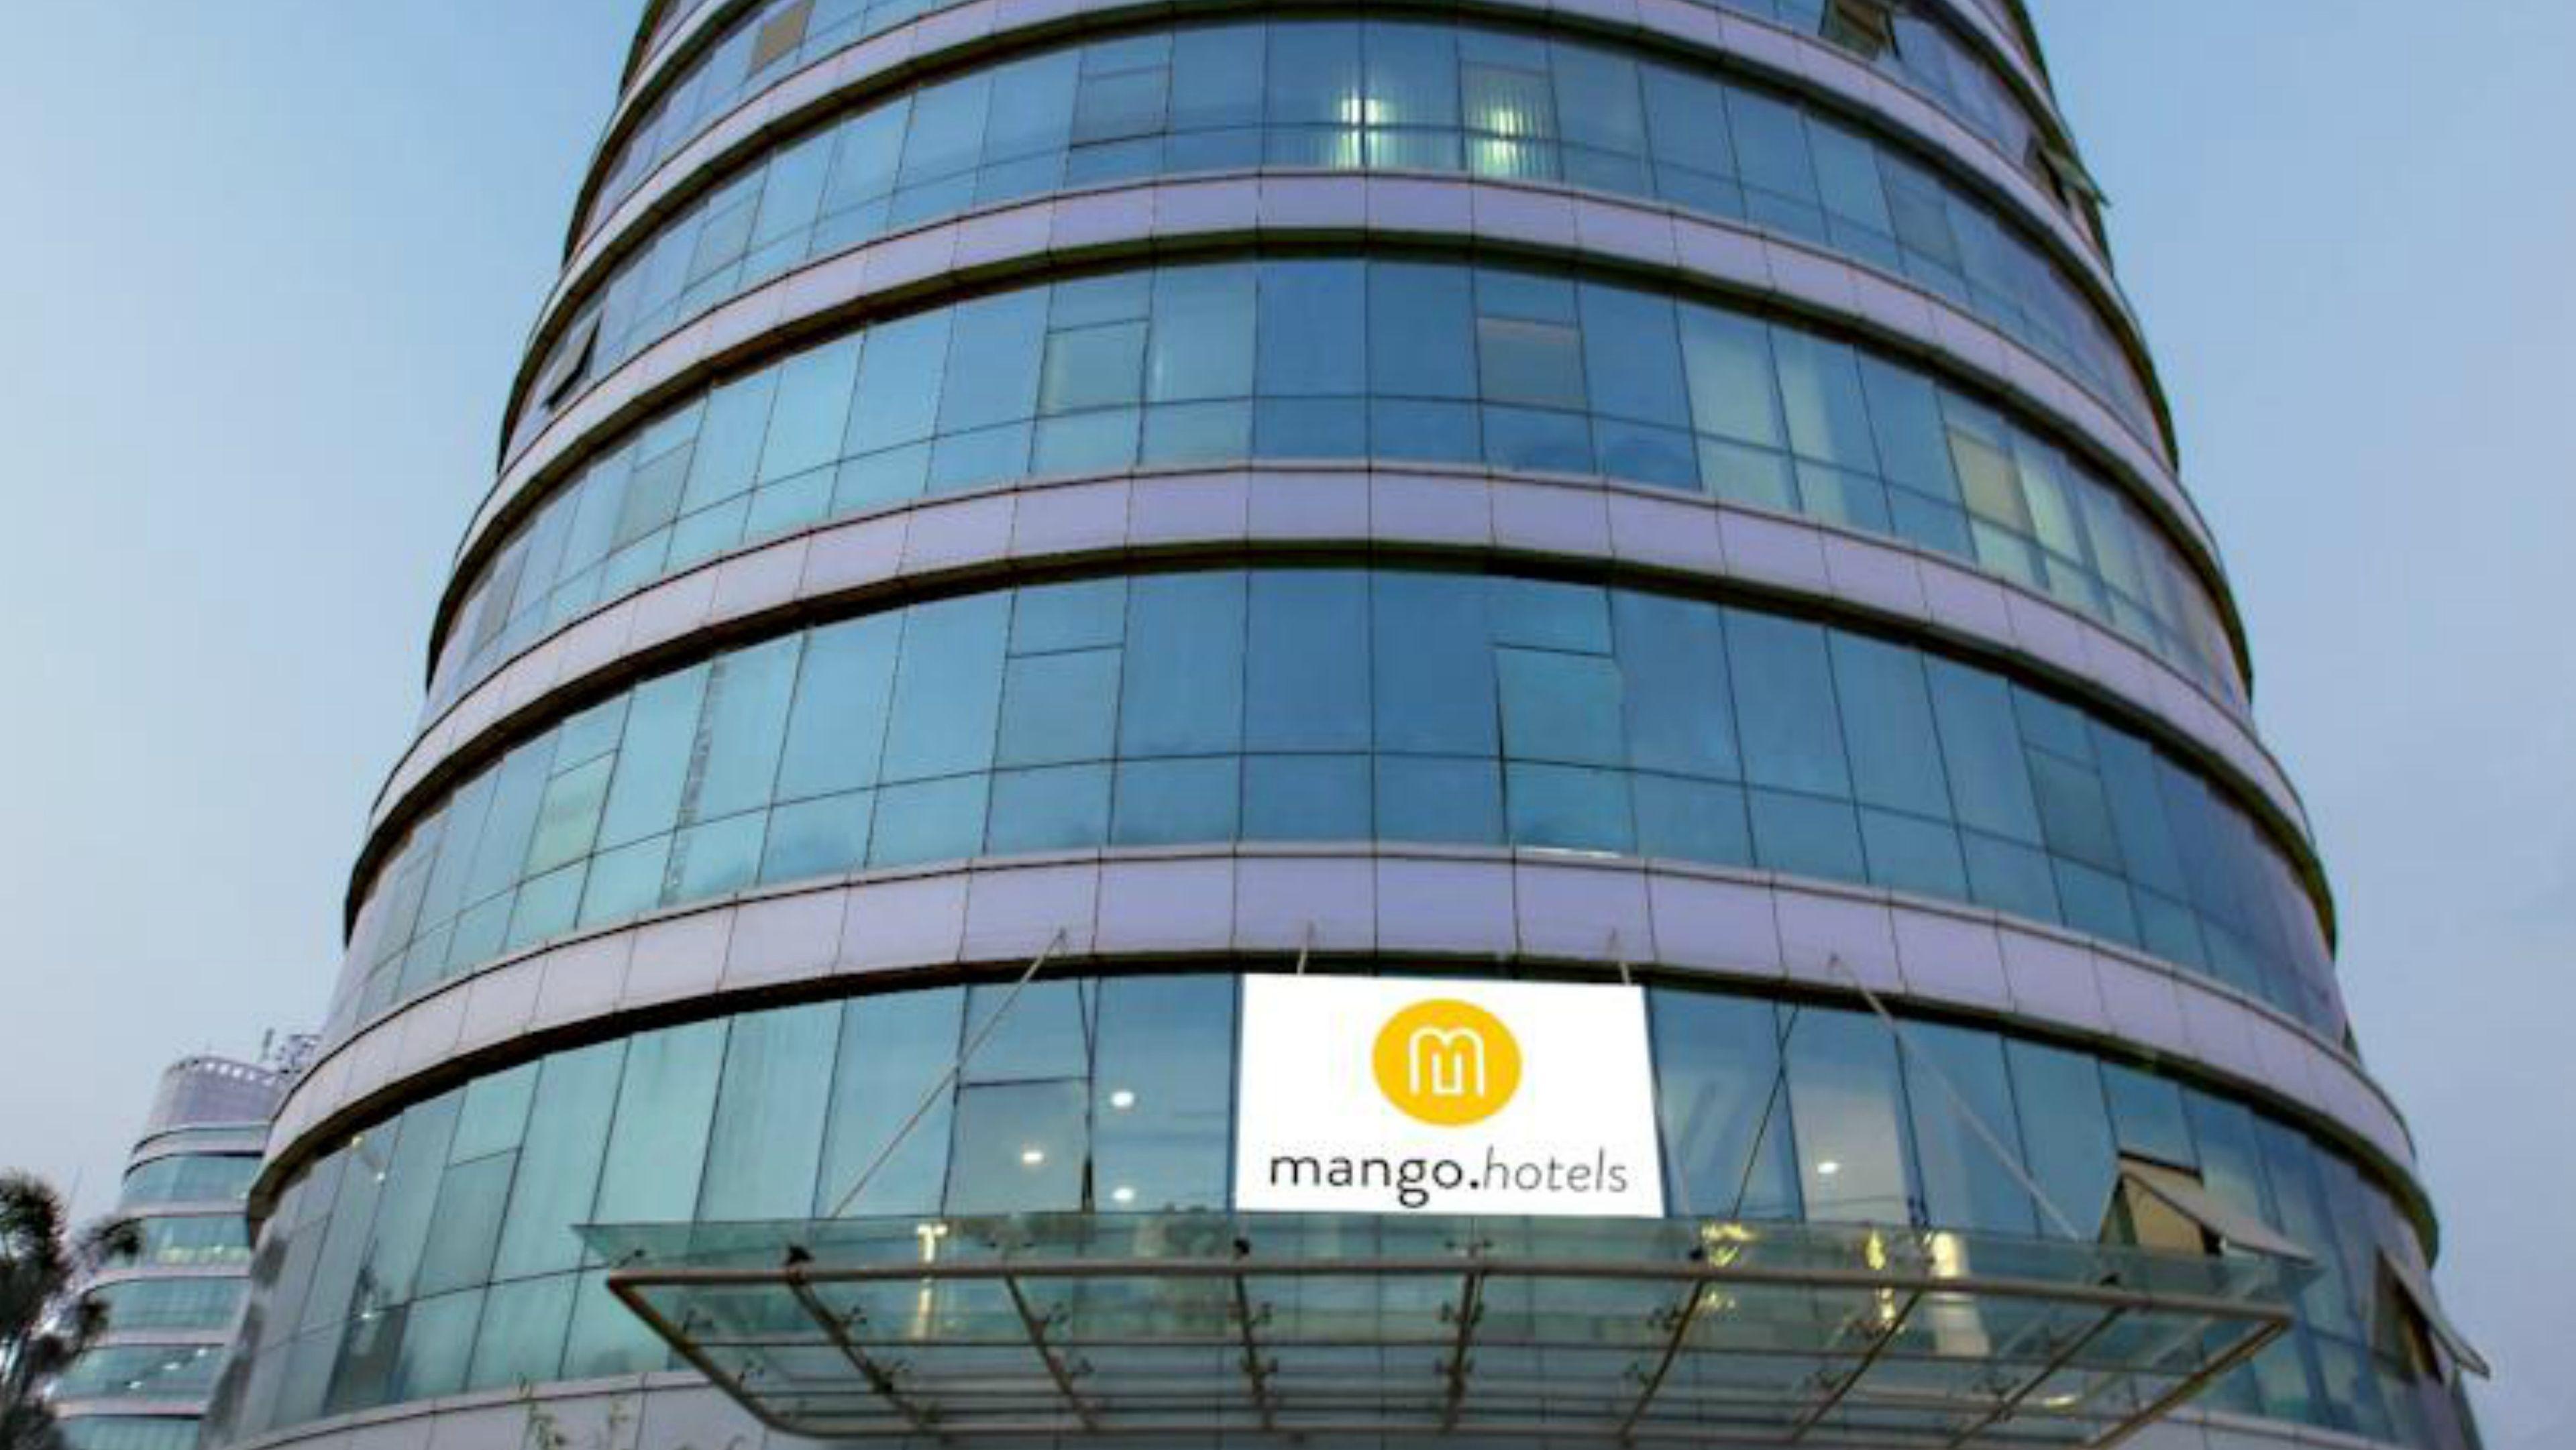 Mango Hotels Airoli Mumbai 2021 Updated Prices Expedia Co In